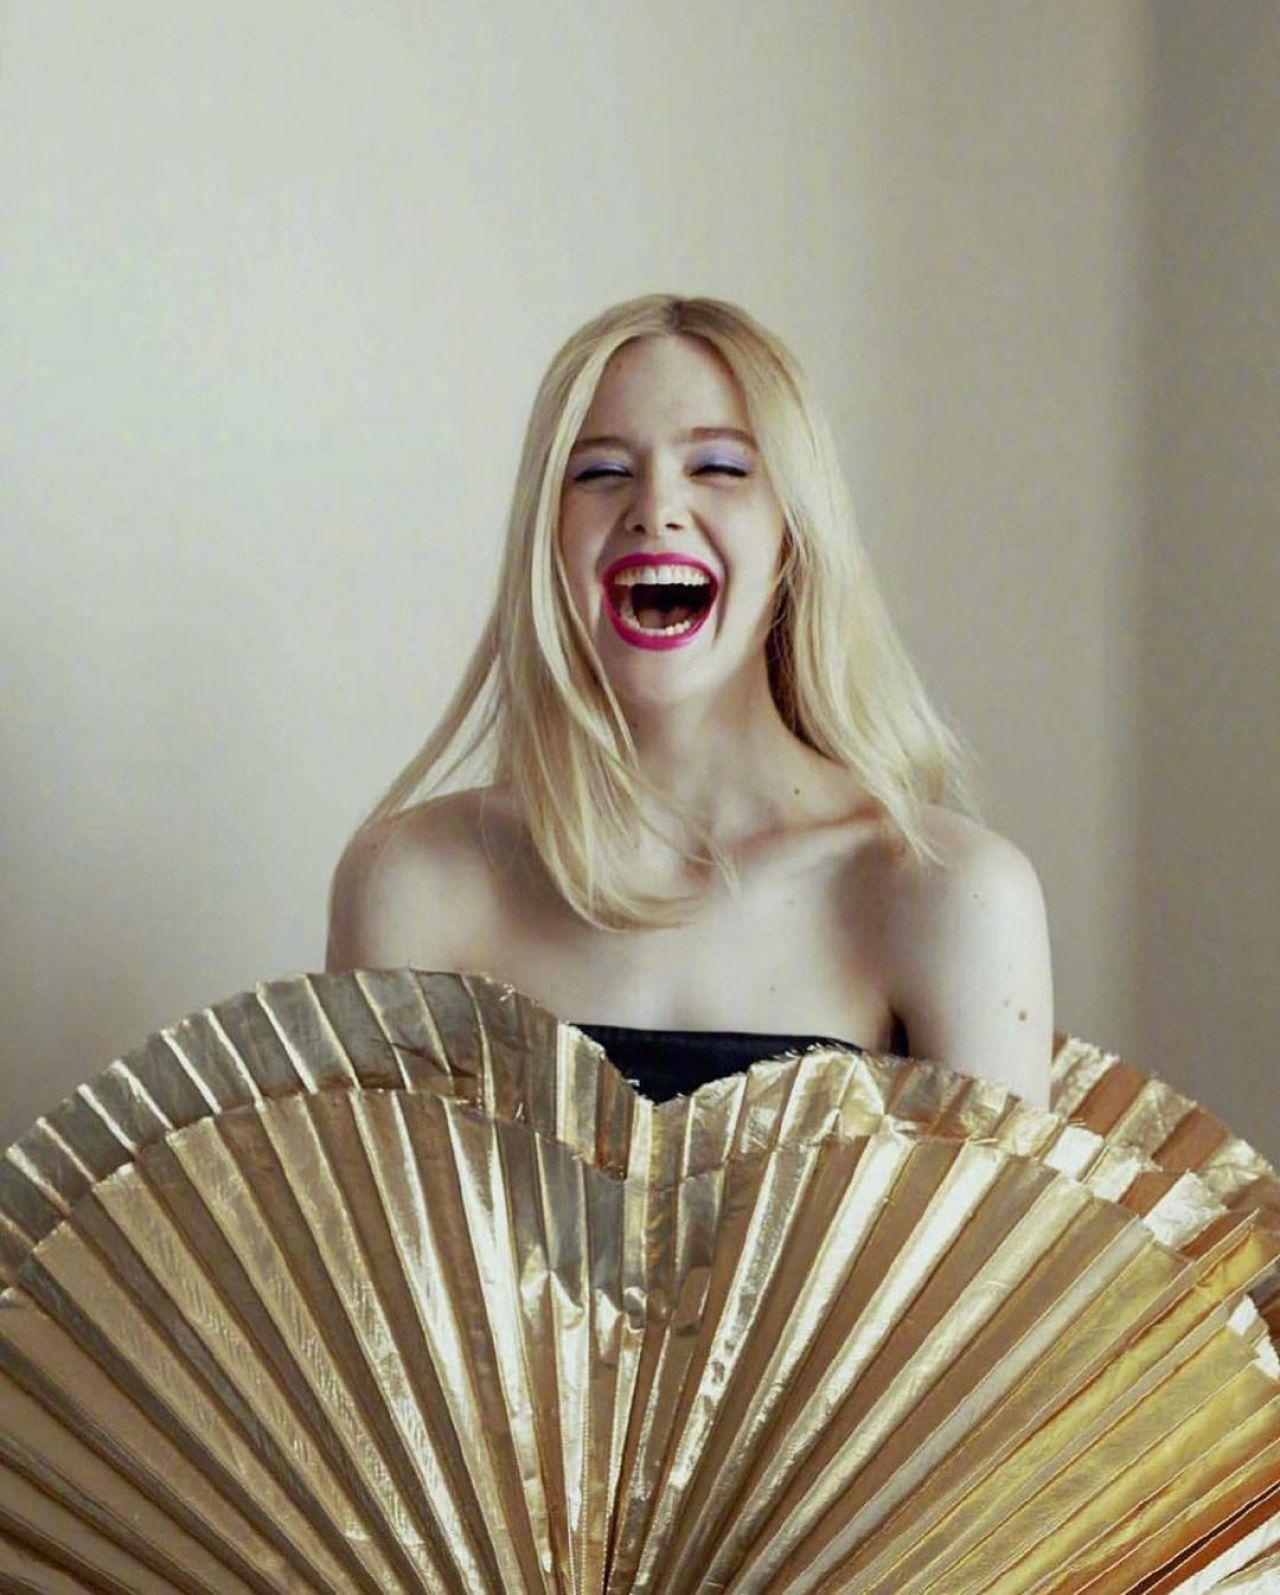 К праздникам готова: Эль Фэннинг в съемке Glamour Spain (фото 3)